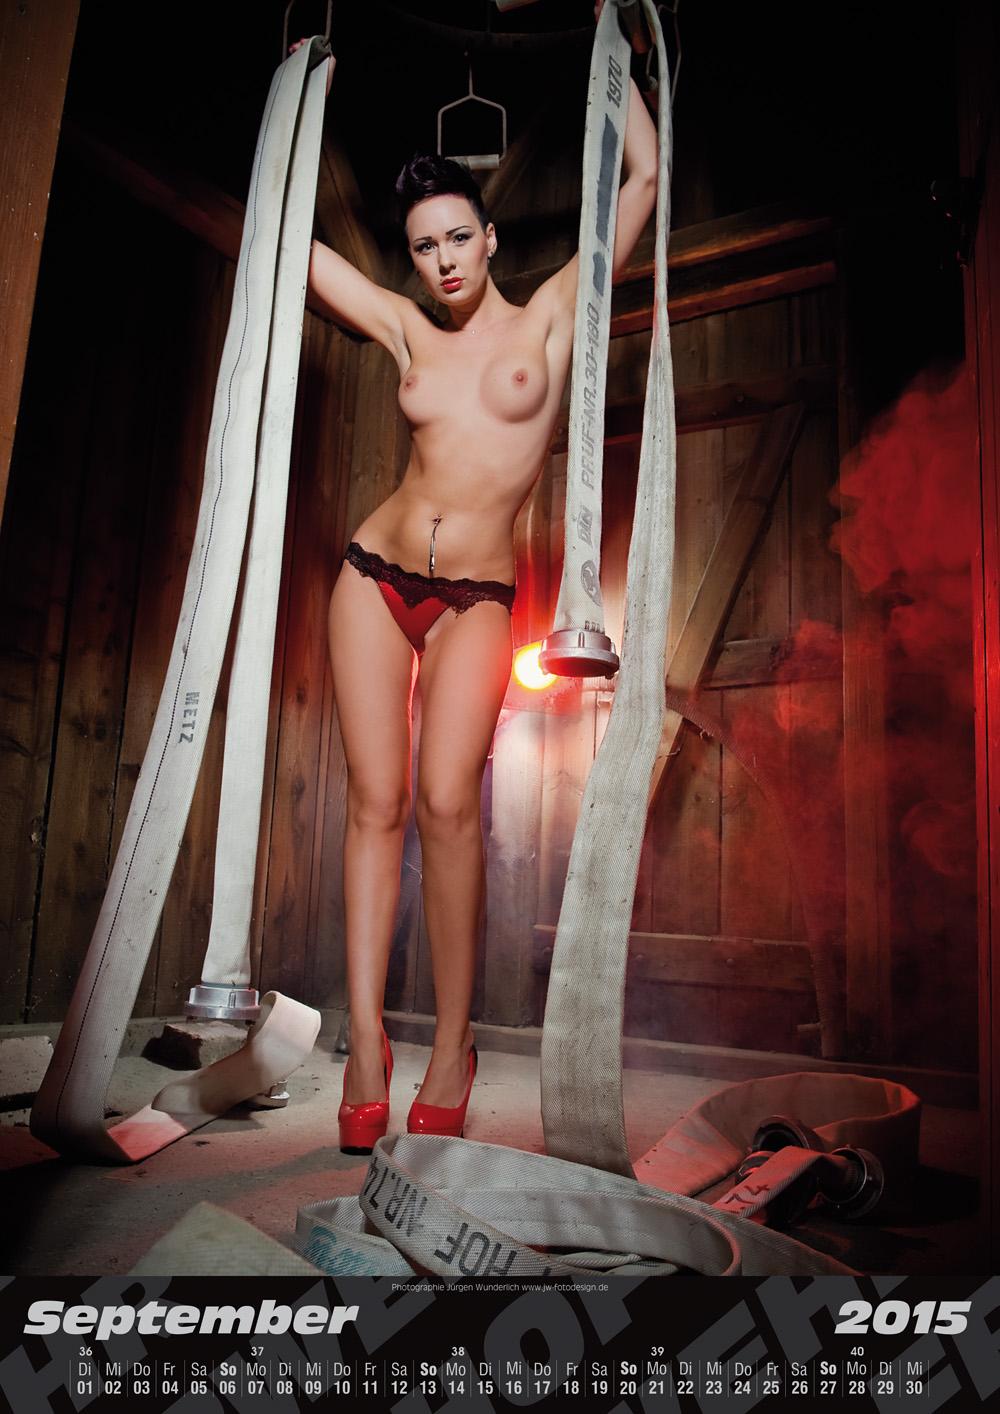 motiv erotik kalender frauenkalender.